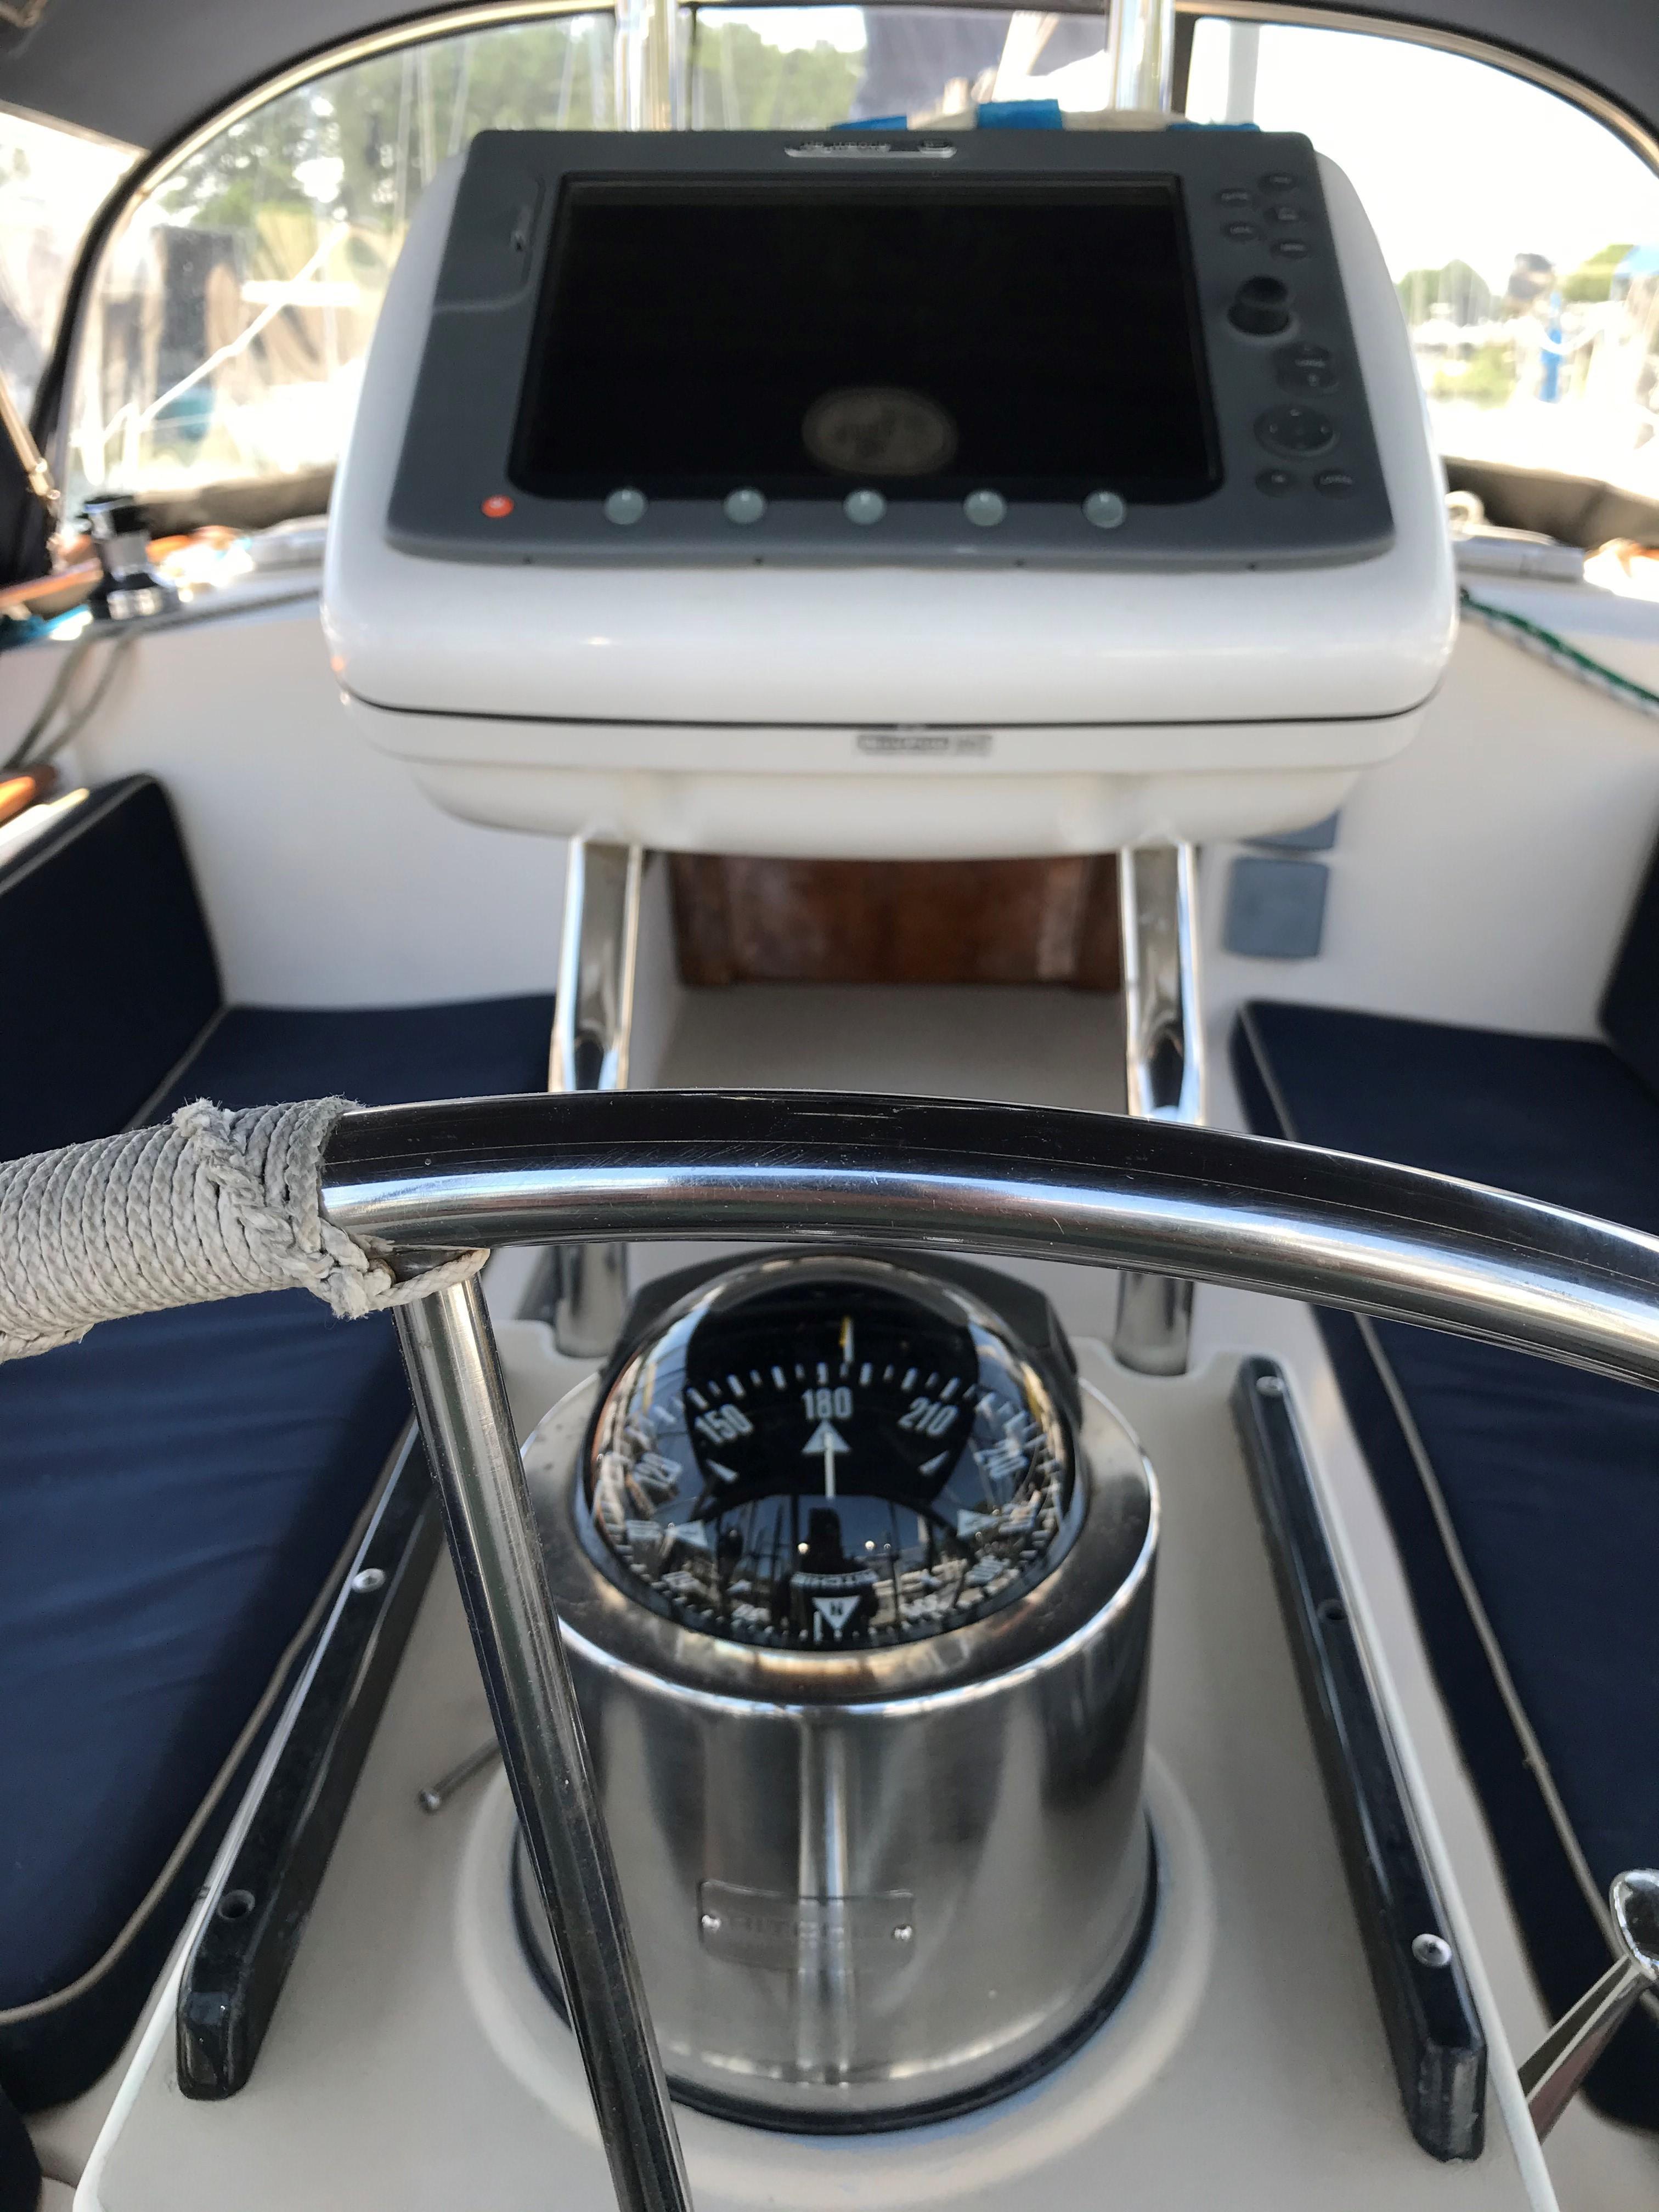 Helm w/navigation instruments & new compass